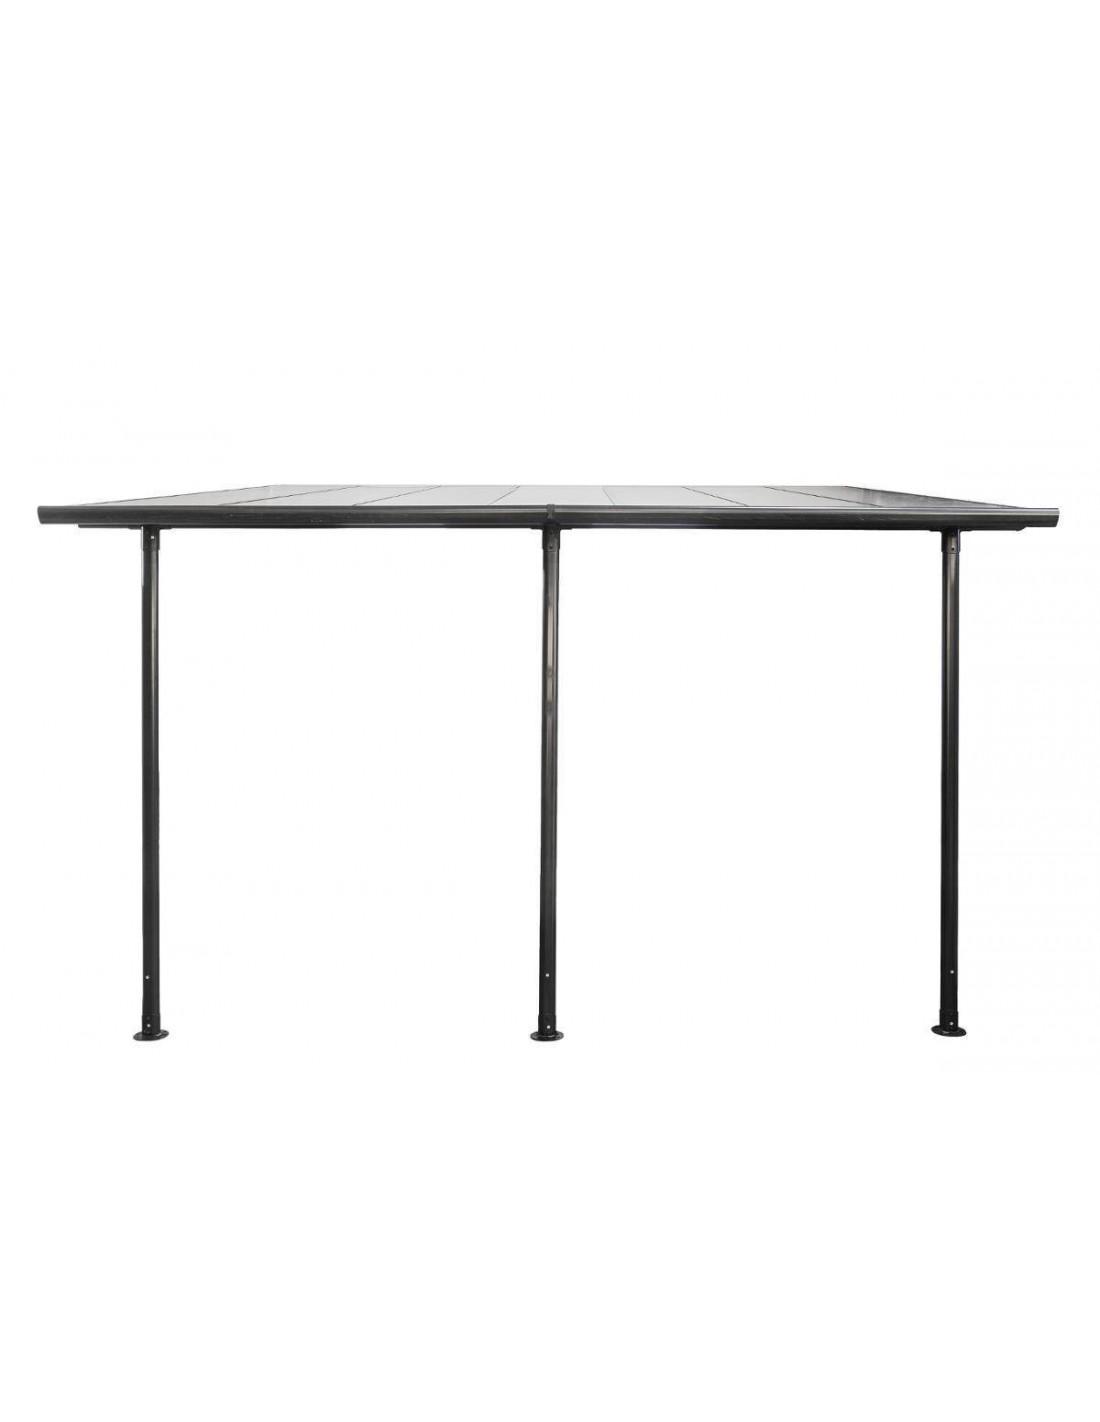 pergola adoss belize 4x3 m en aluminium et polycarbonate hesperide. Black Bedroom Furniture Sets. Home Design Ideas